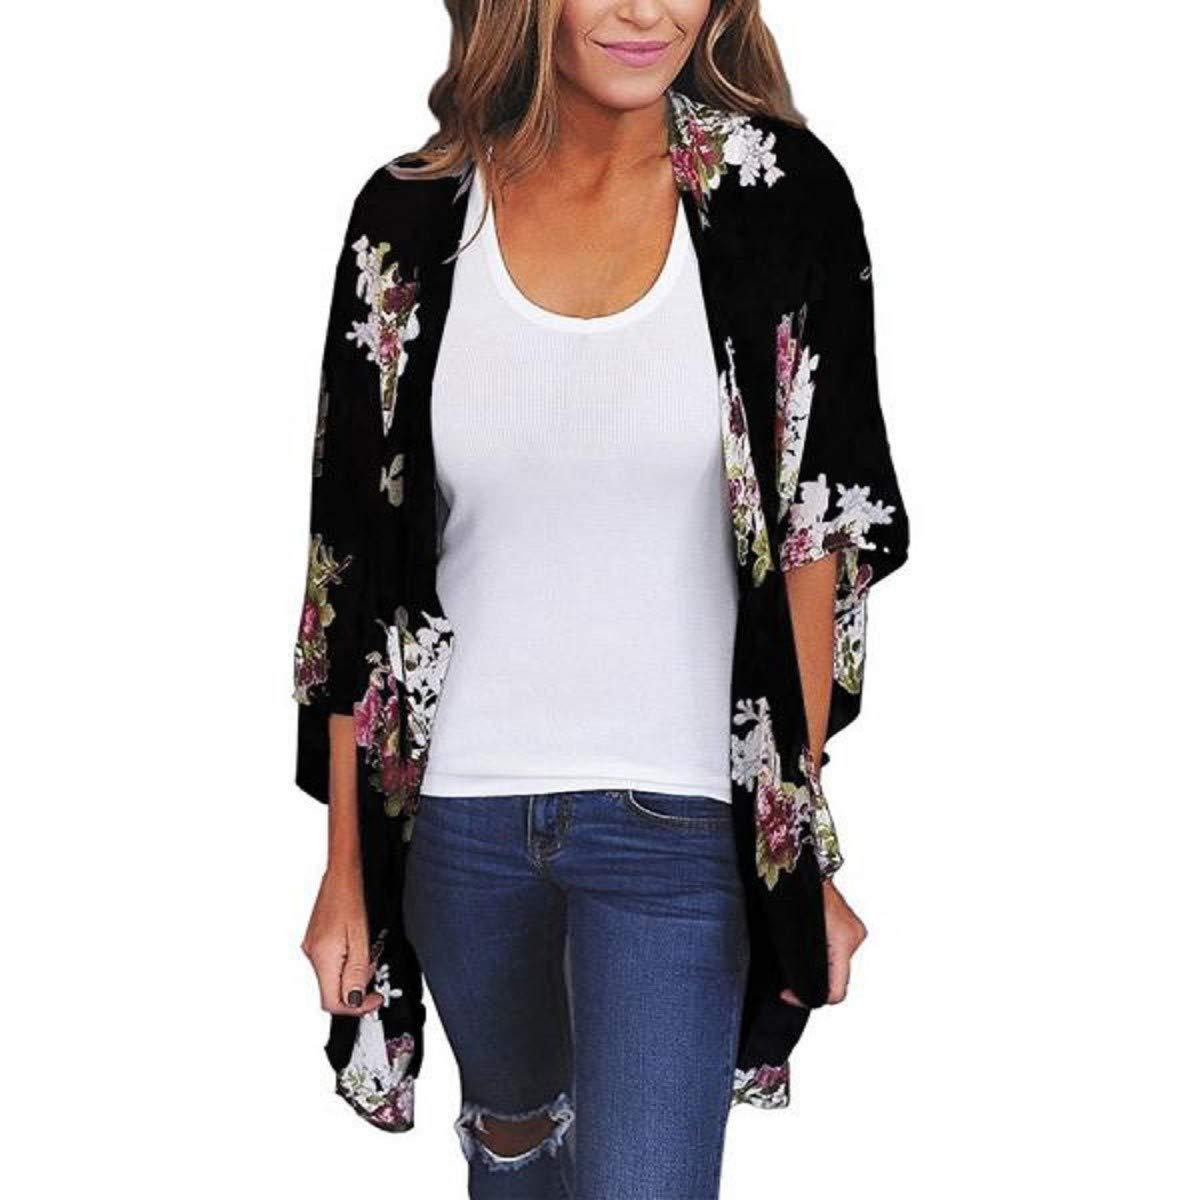 OTINICE Women's Chiffon Kimono Cardigans Floral Puff Sleeve Casual Loose Swimwear Cover ups Black